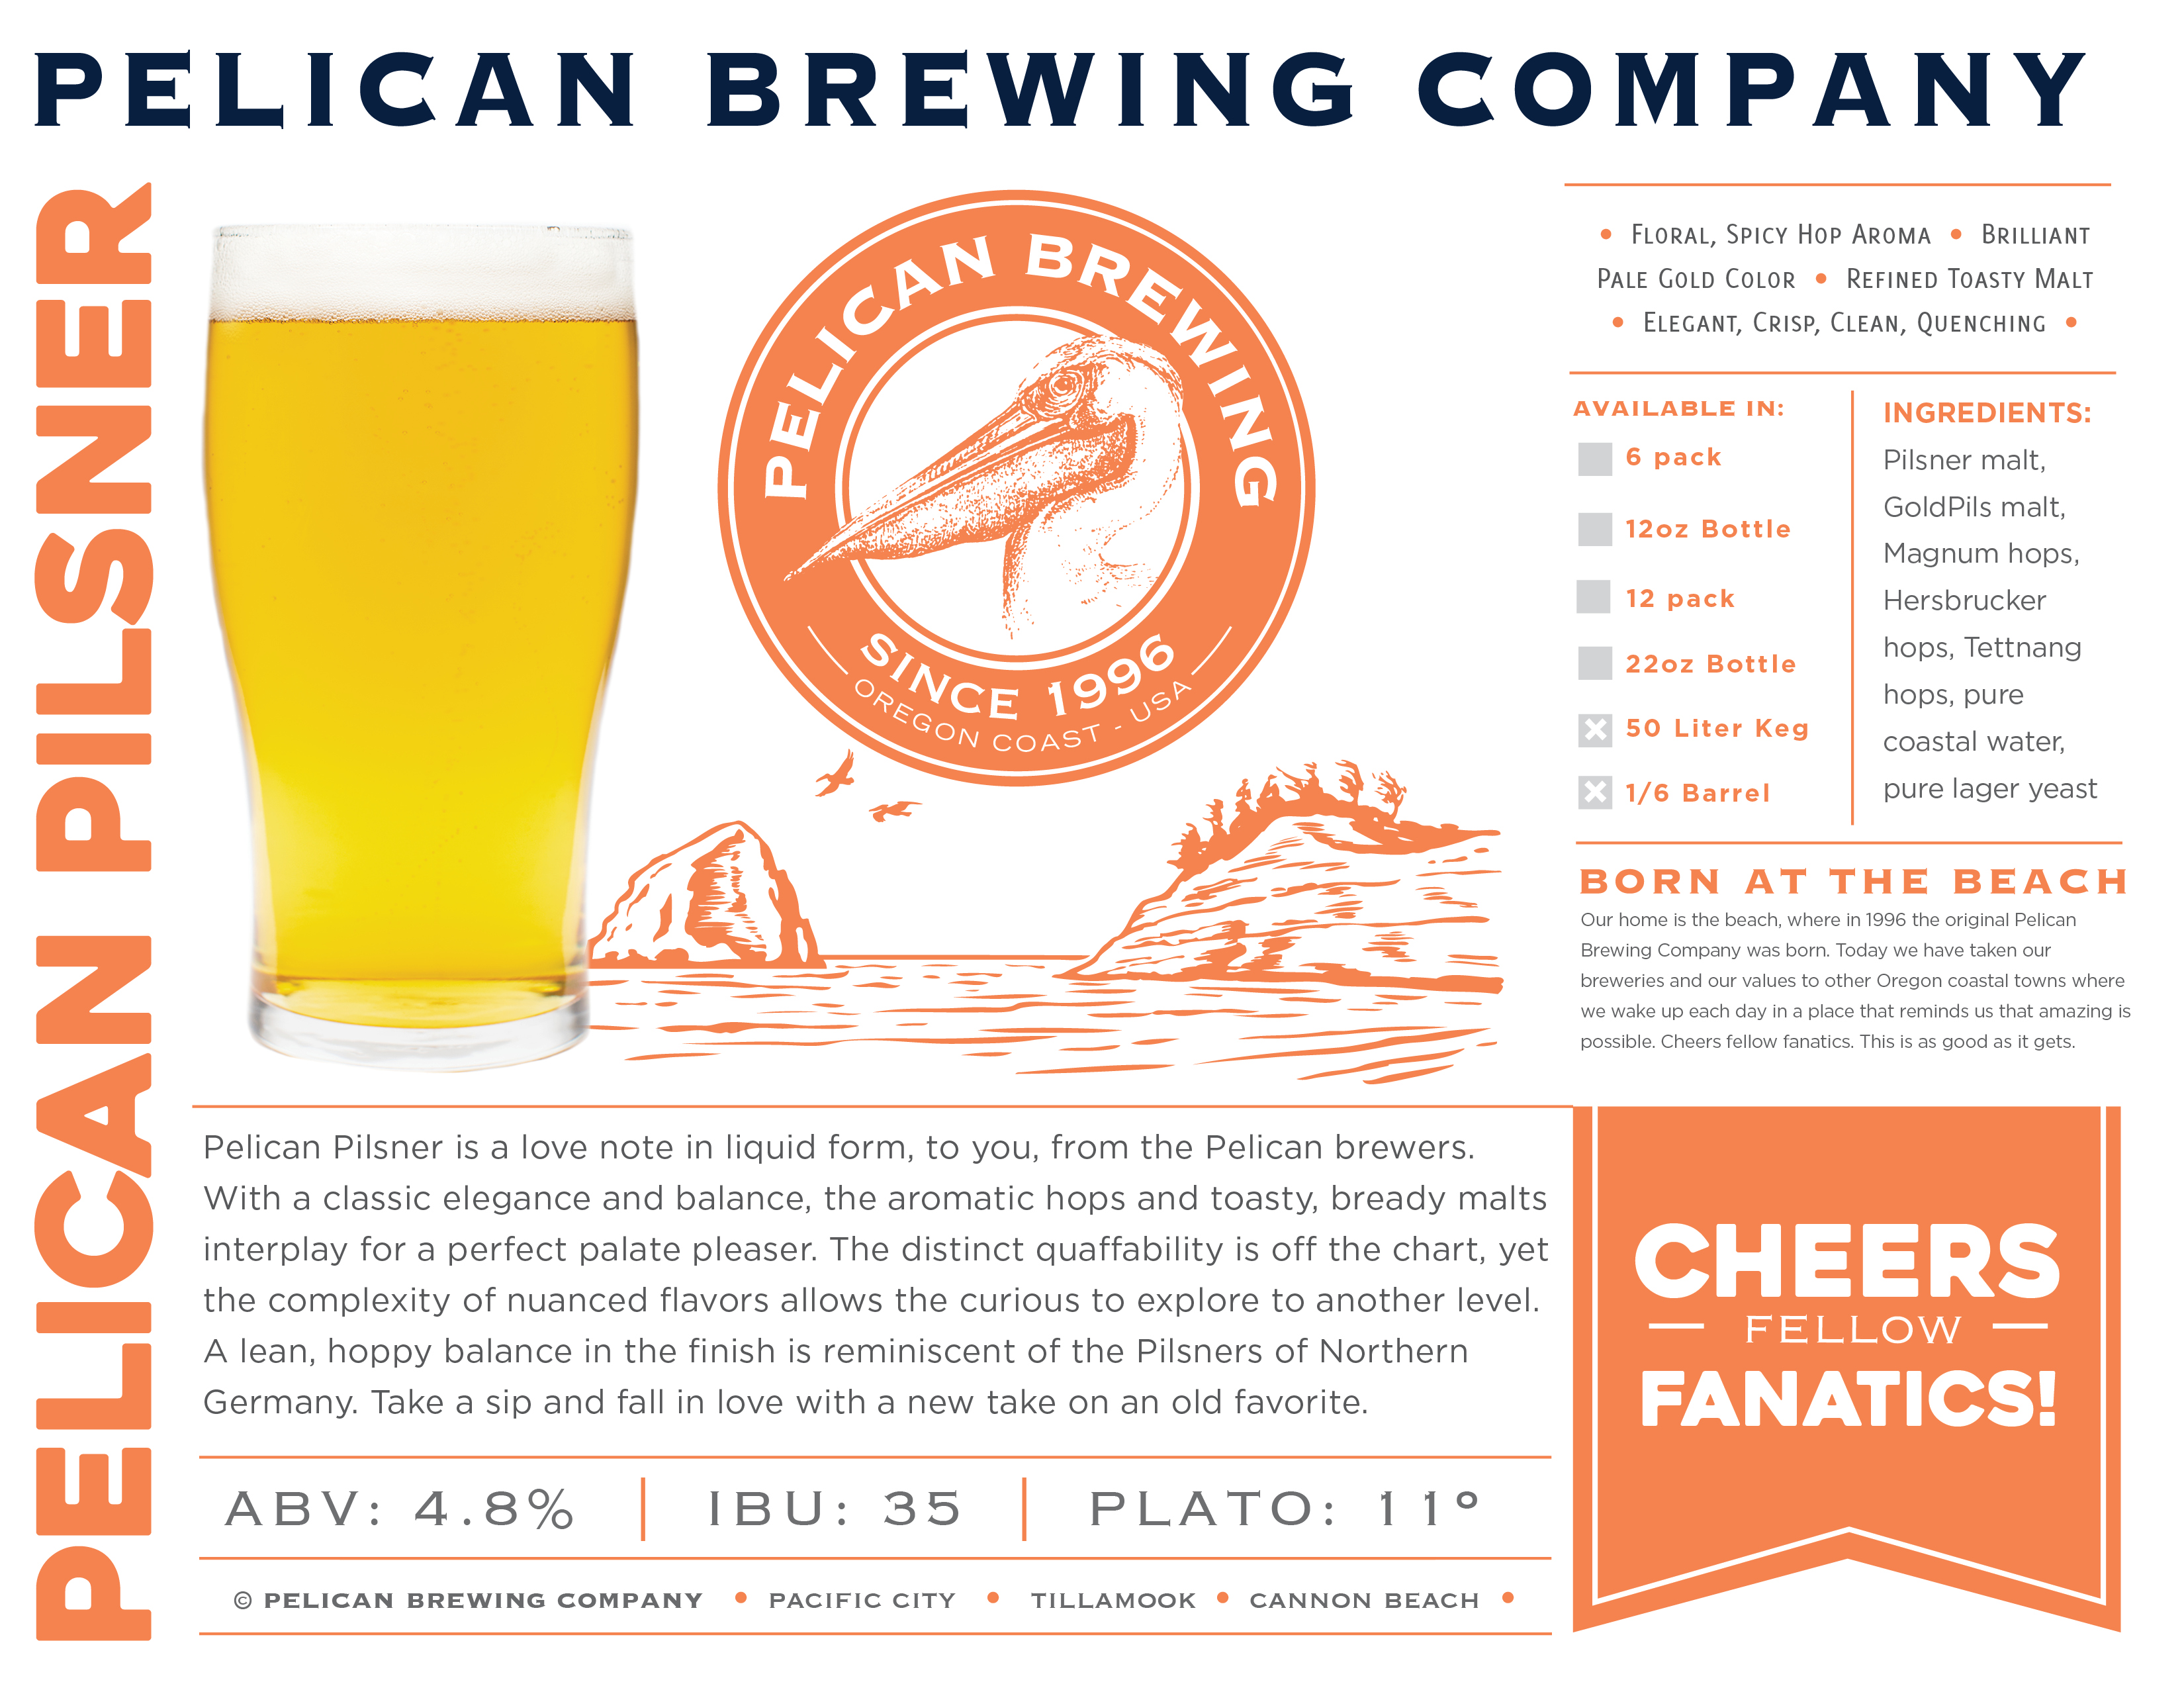 Pelican Brewing Company Releases Pilsner | Brewbound